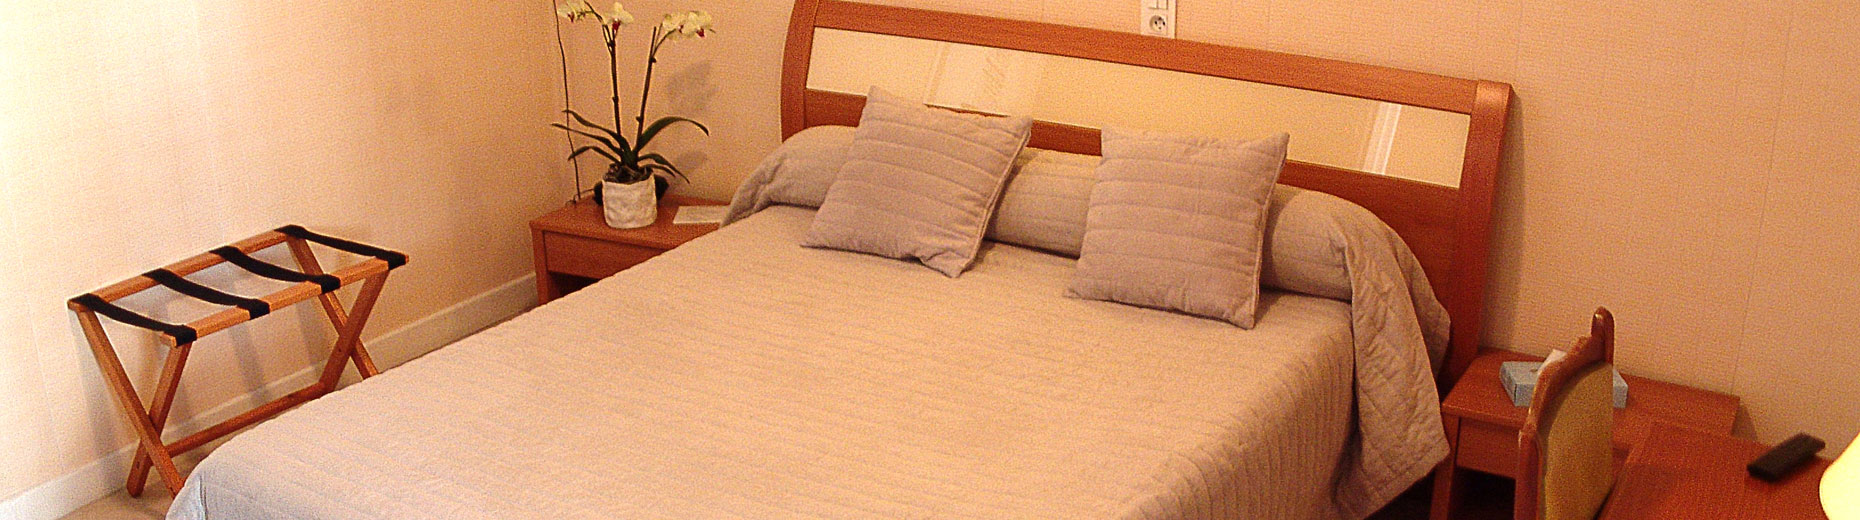 chambre-hotel-ecu-france-1860x520